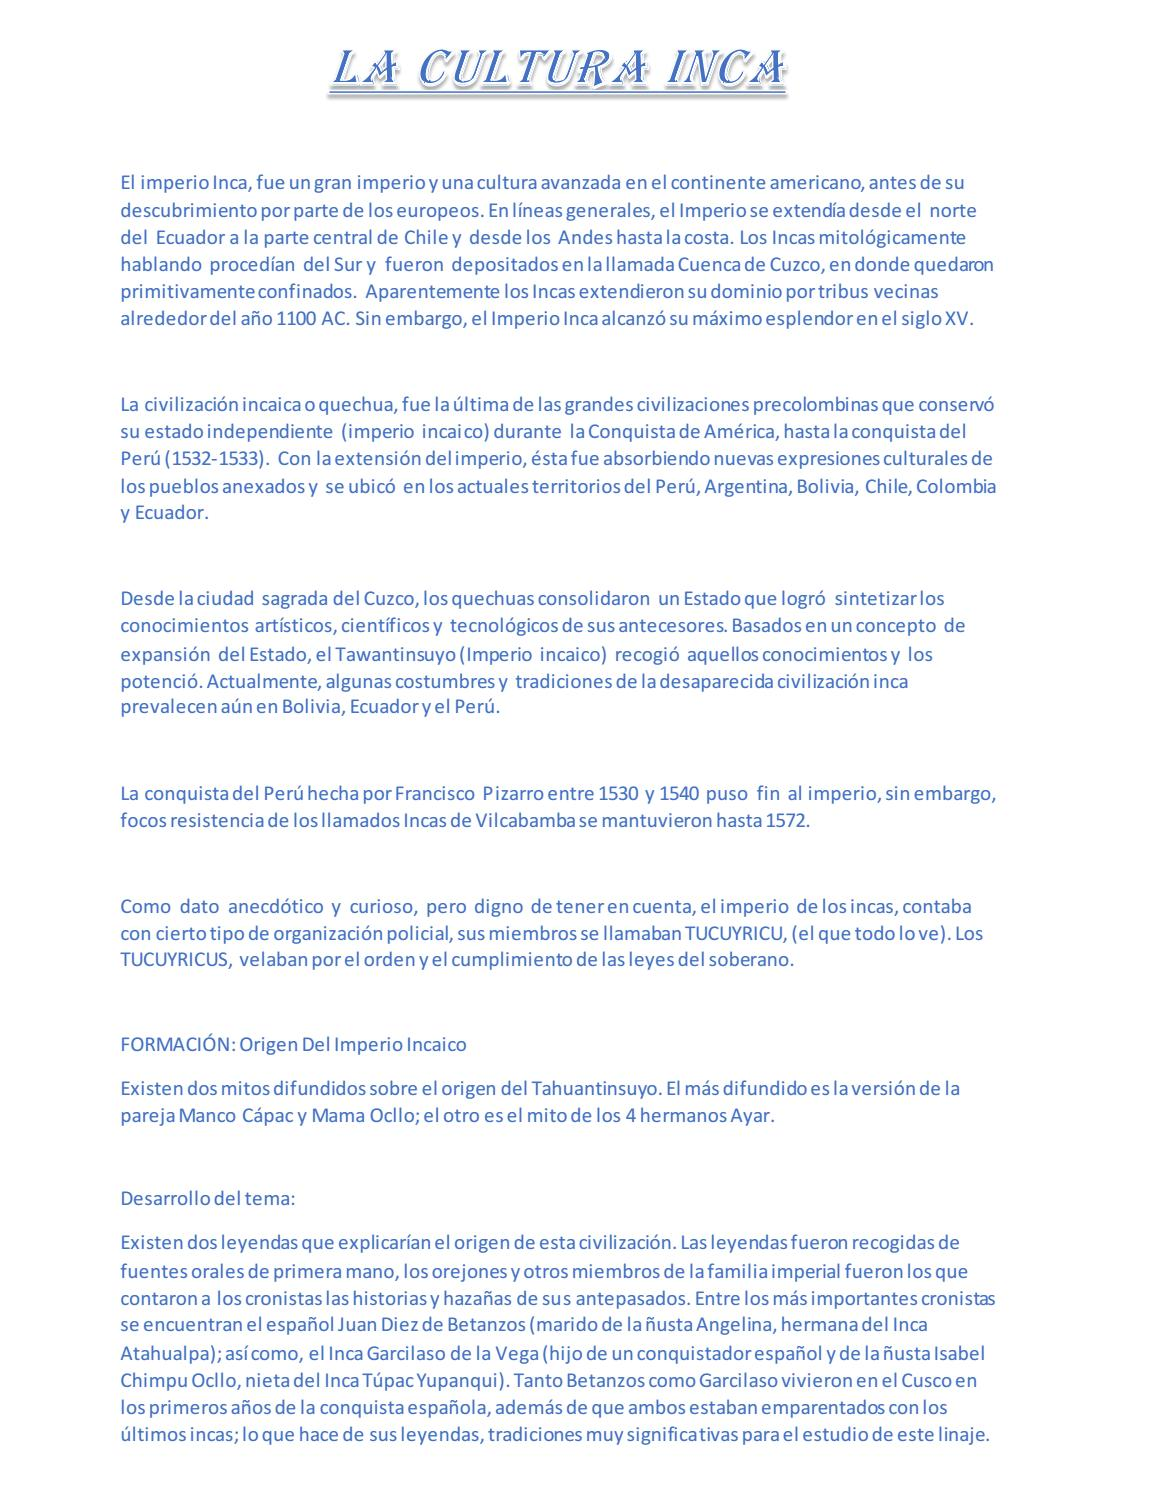 La cultura Inca pdf 2017 by Antony Alexander - issuu